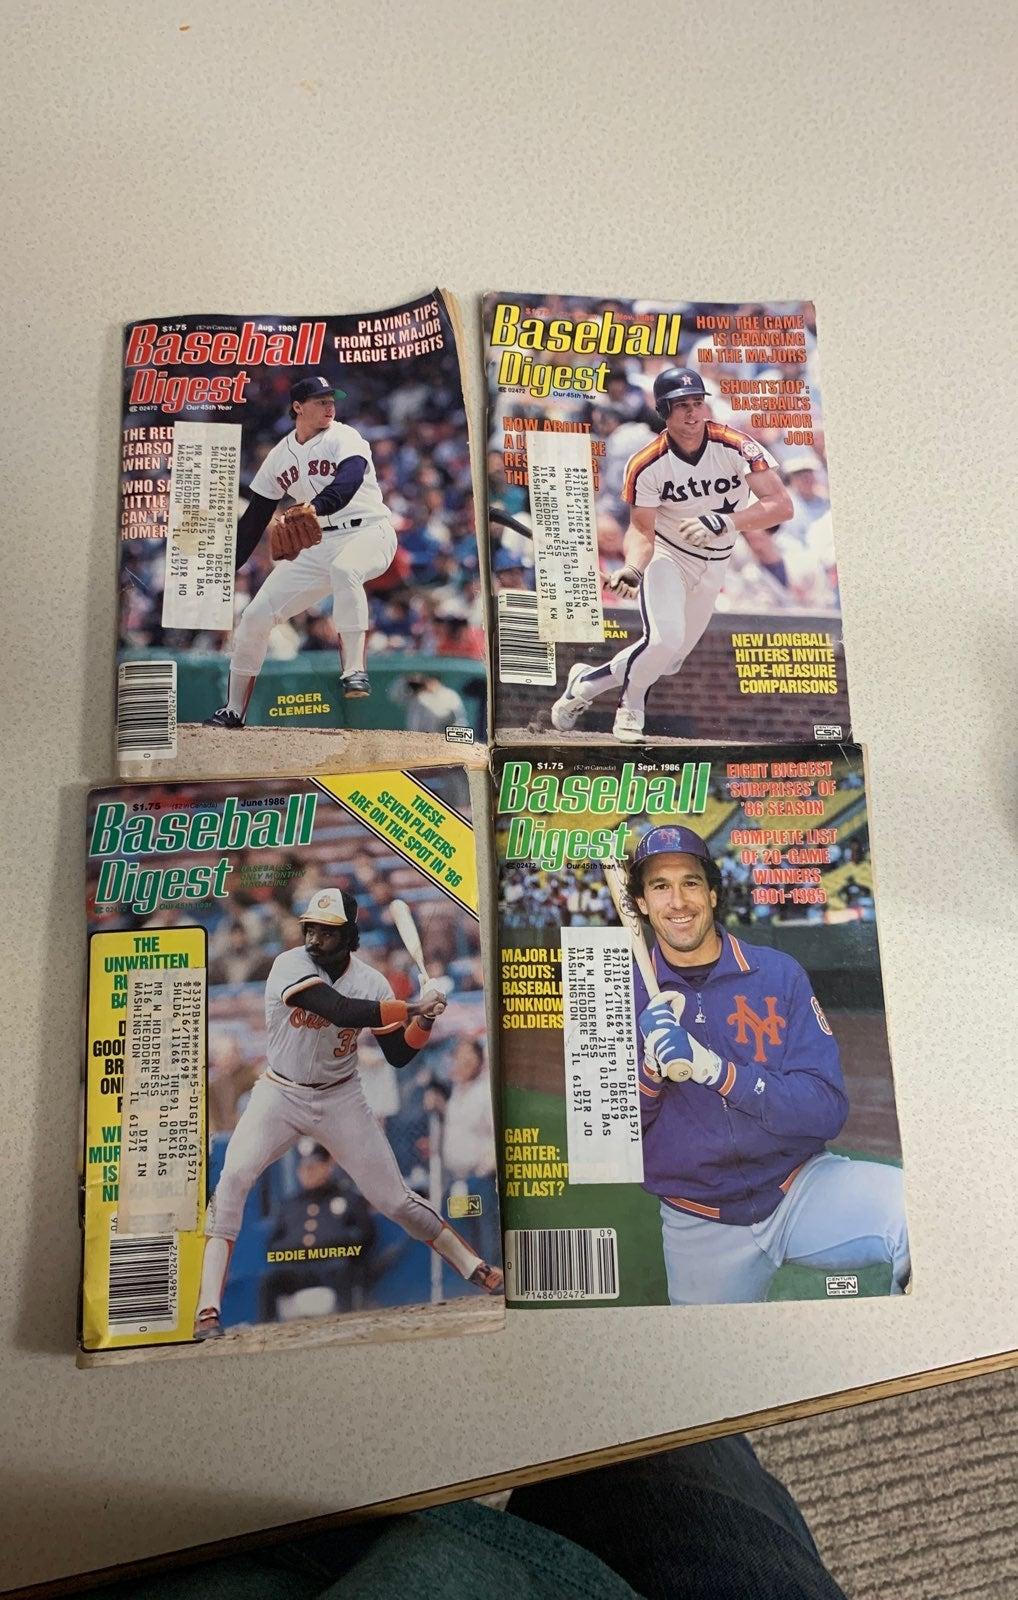 4 baseball digest lot